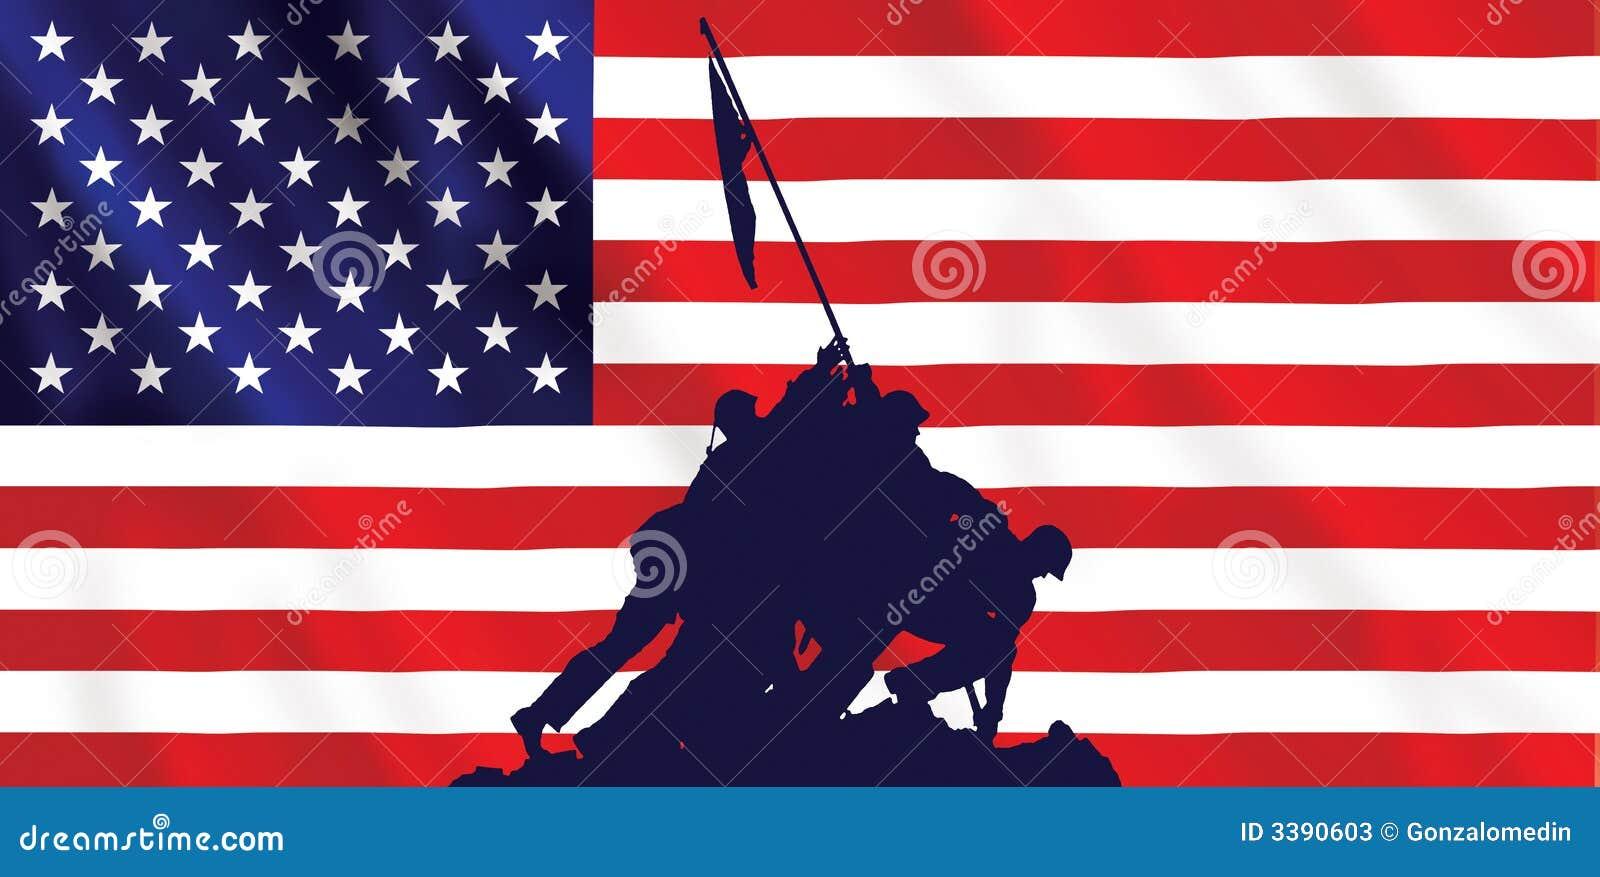 Iwo Jima Wallpapers Wallpaper 1920?1080 Raising the Flag on Iwo ...